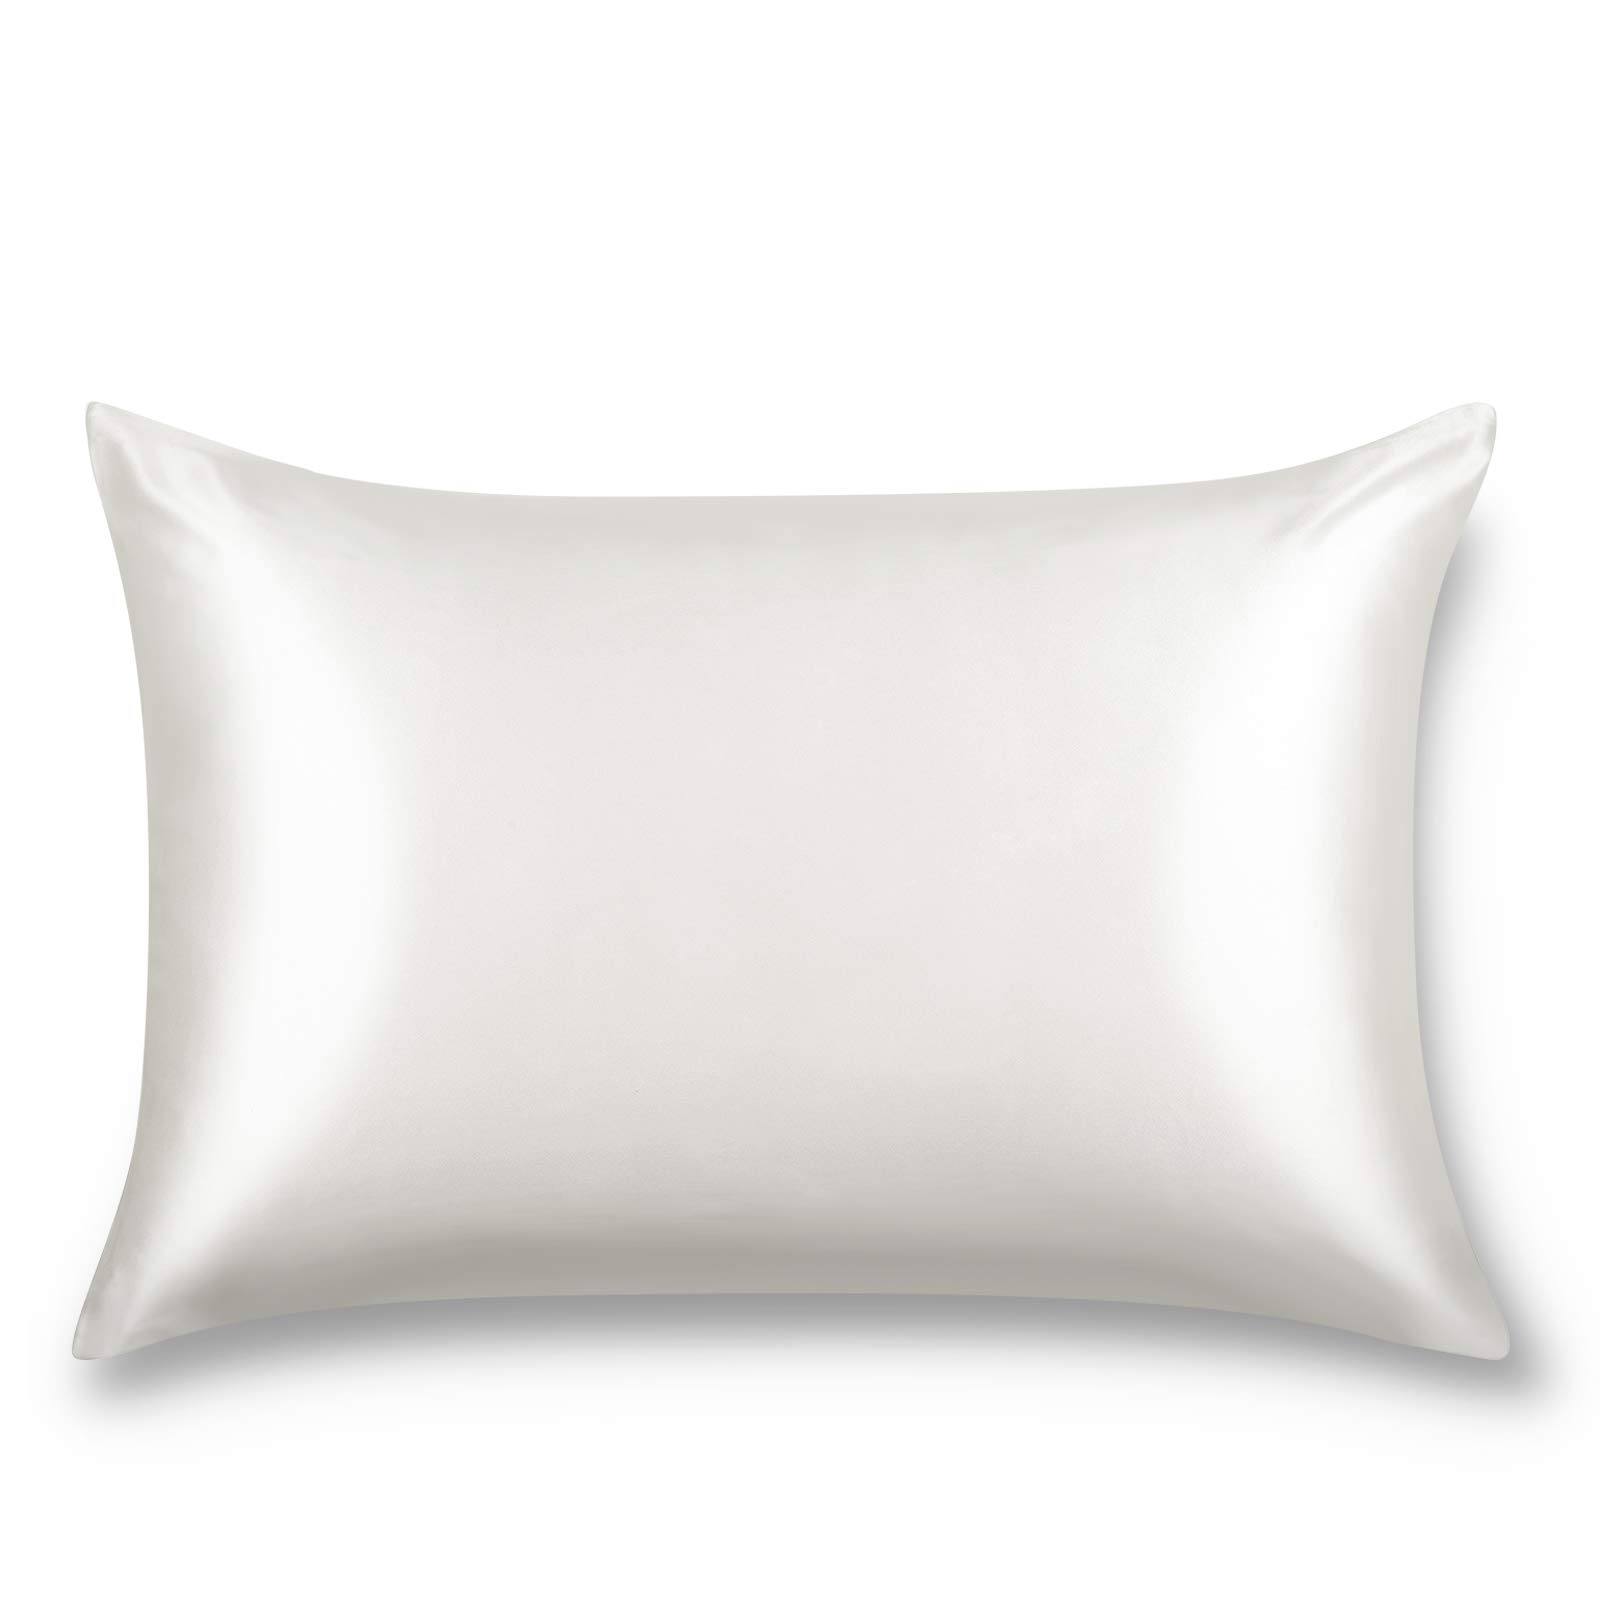 ALASKA BEAR Natural Silk Pillowcase, Hypoallergenic, 19 Momme, 600 Thread Count 100 Percent Mulberry Silk, Queen Size with Hidden Zipper (1, Ivory White)